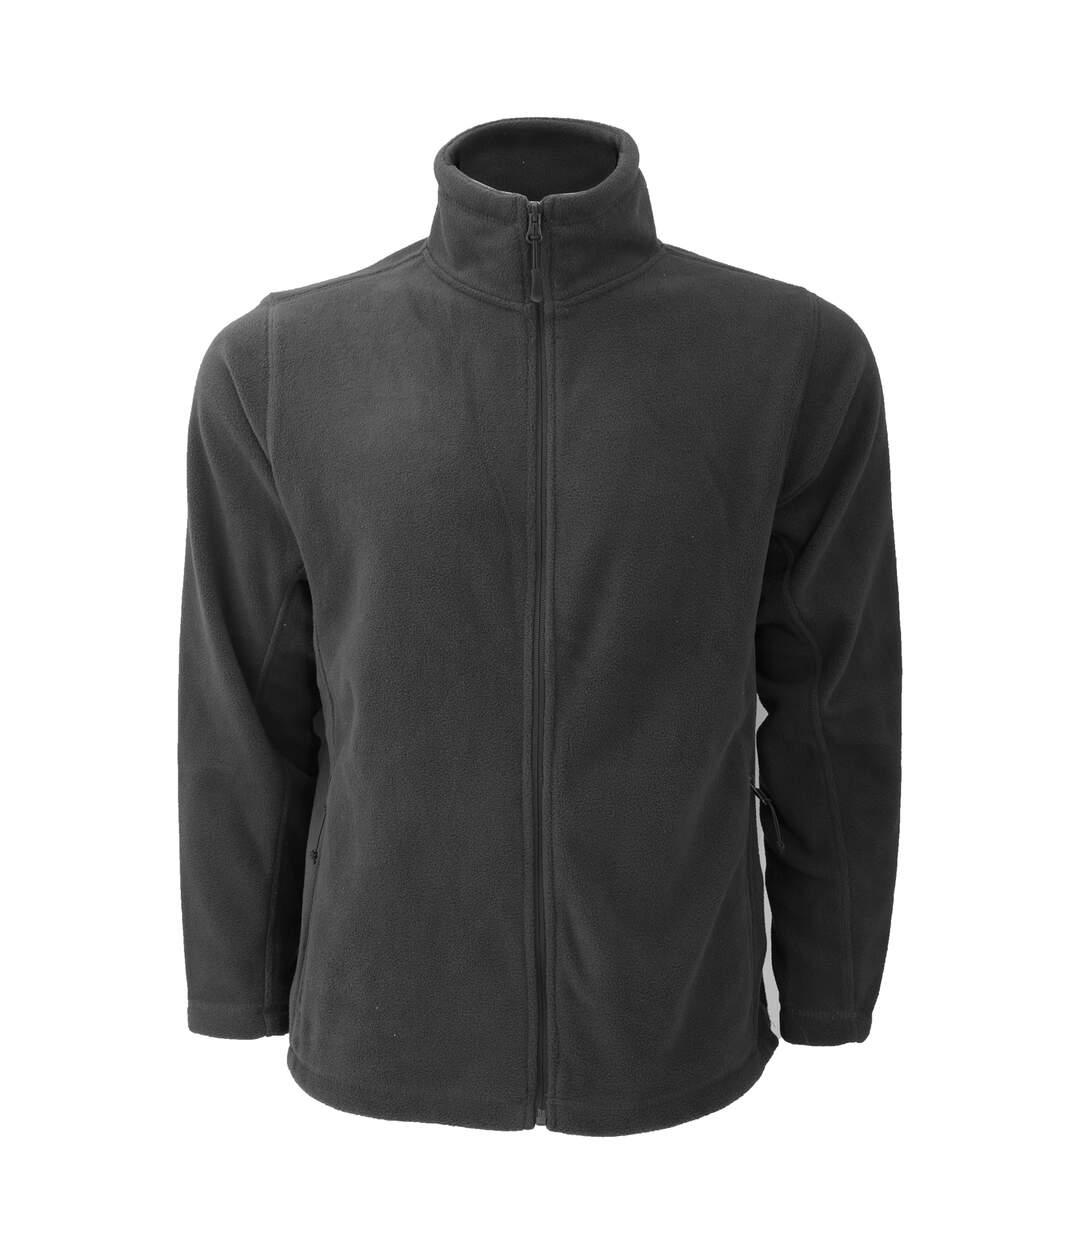 Russell Mens Full Zip Outdoor Fleece Jacket (Bottle Green) - UTBC575